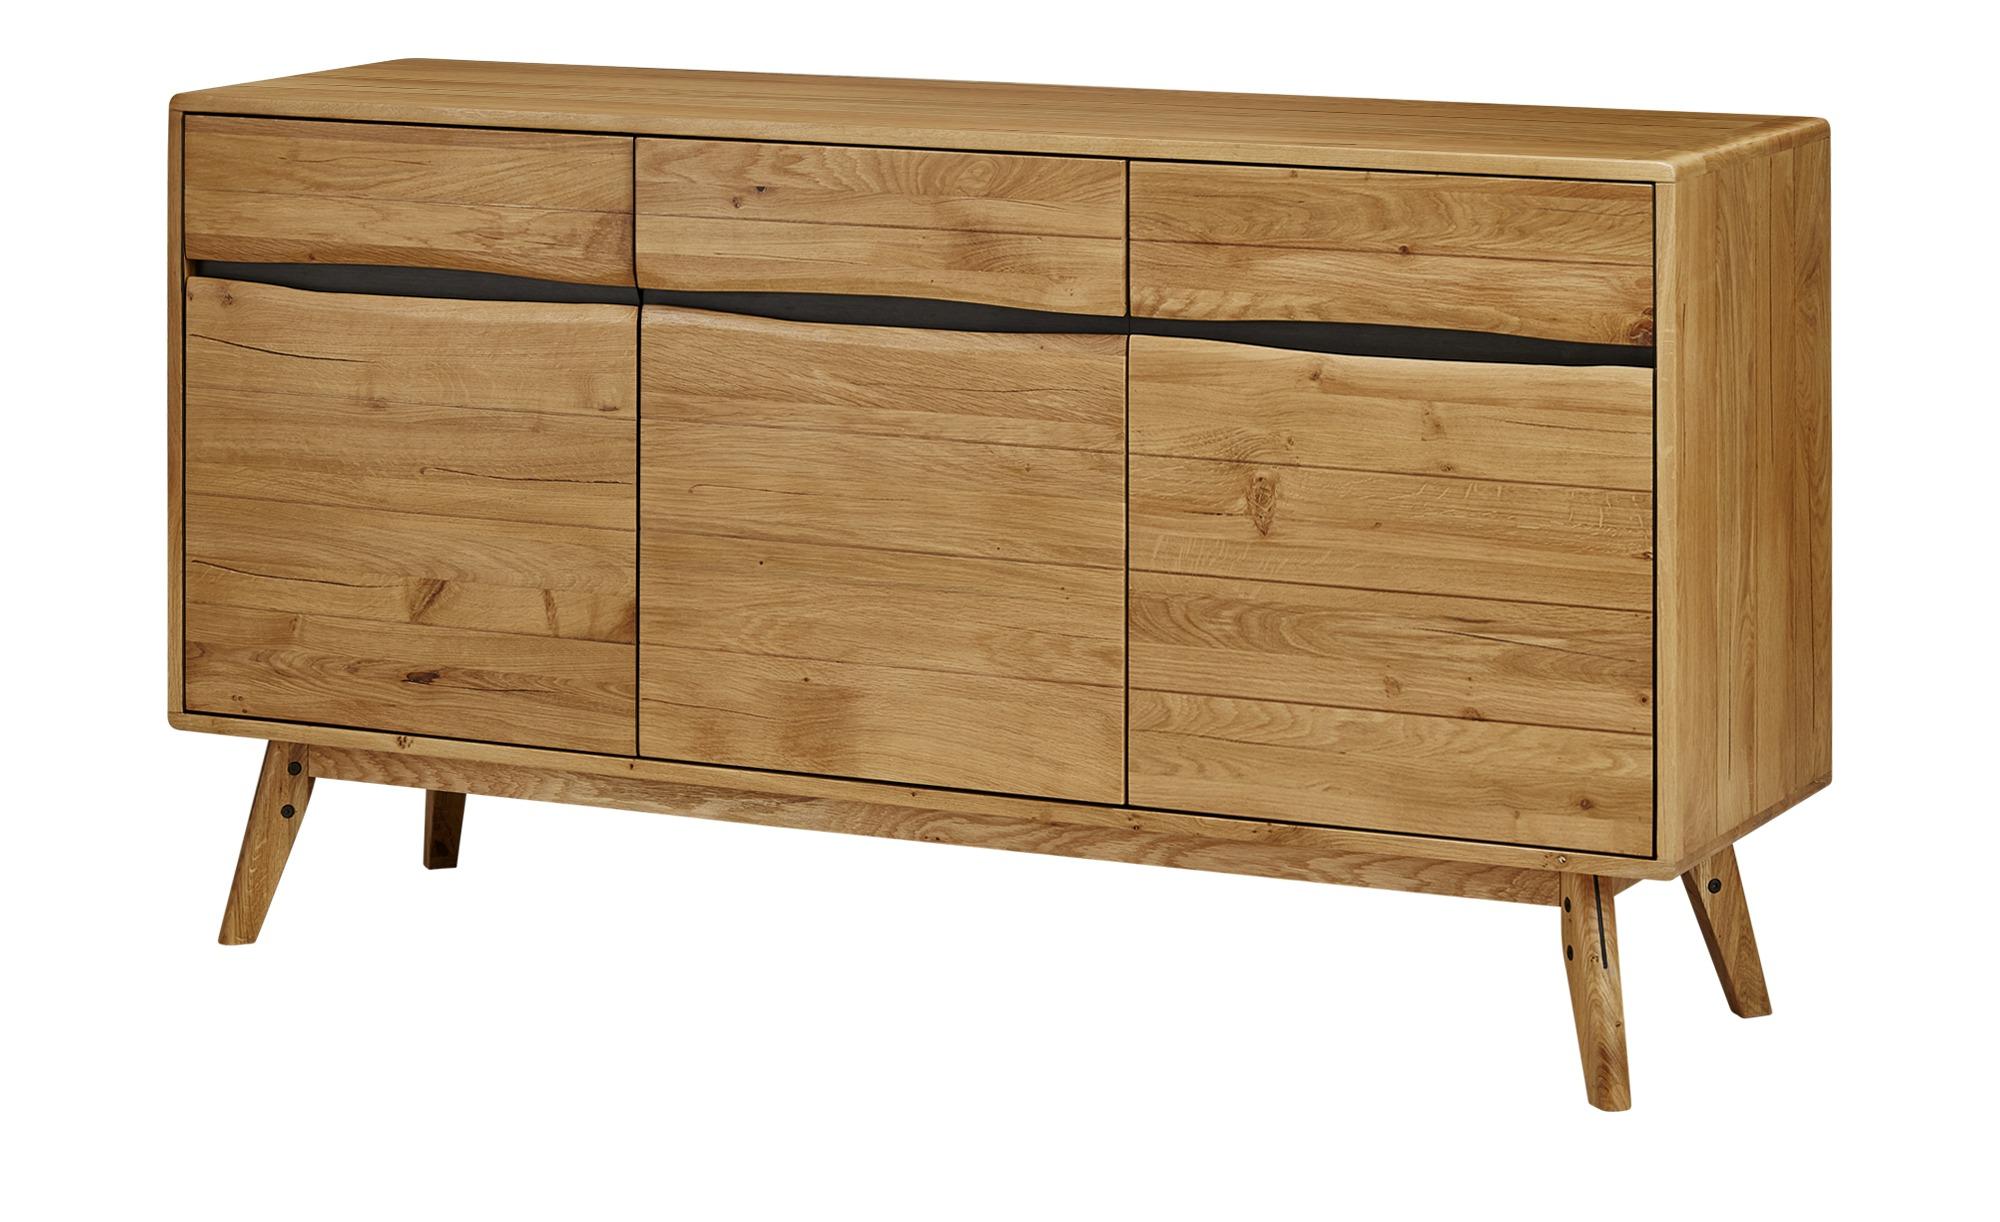 Sideboard  Cinnamon ¦ holzfarben ¦ Maße (cm): B: 160 H: 88 T: 45 Kommoden & Sideboards > Sideboards - Höffner